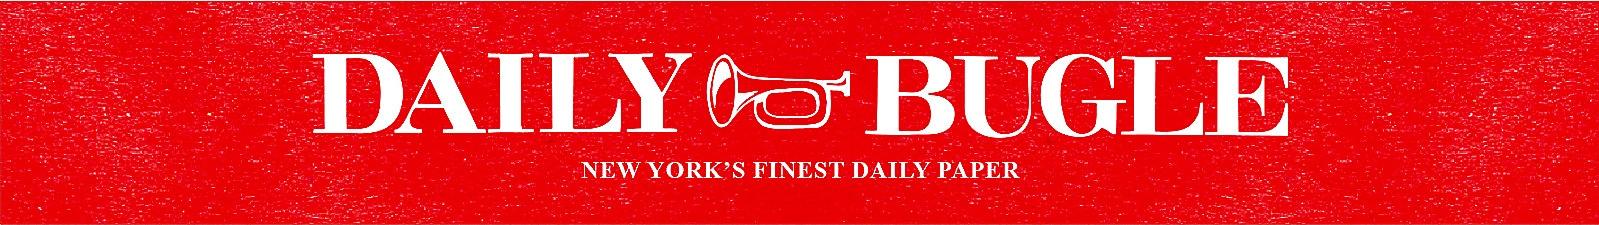 daily bugle-rubrik